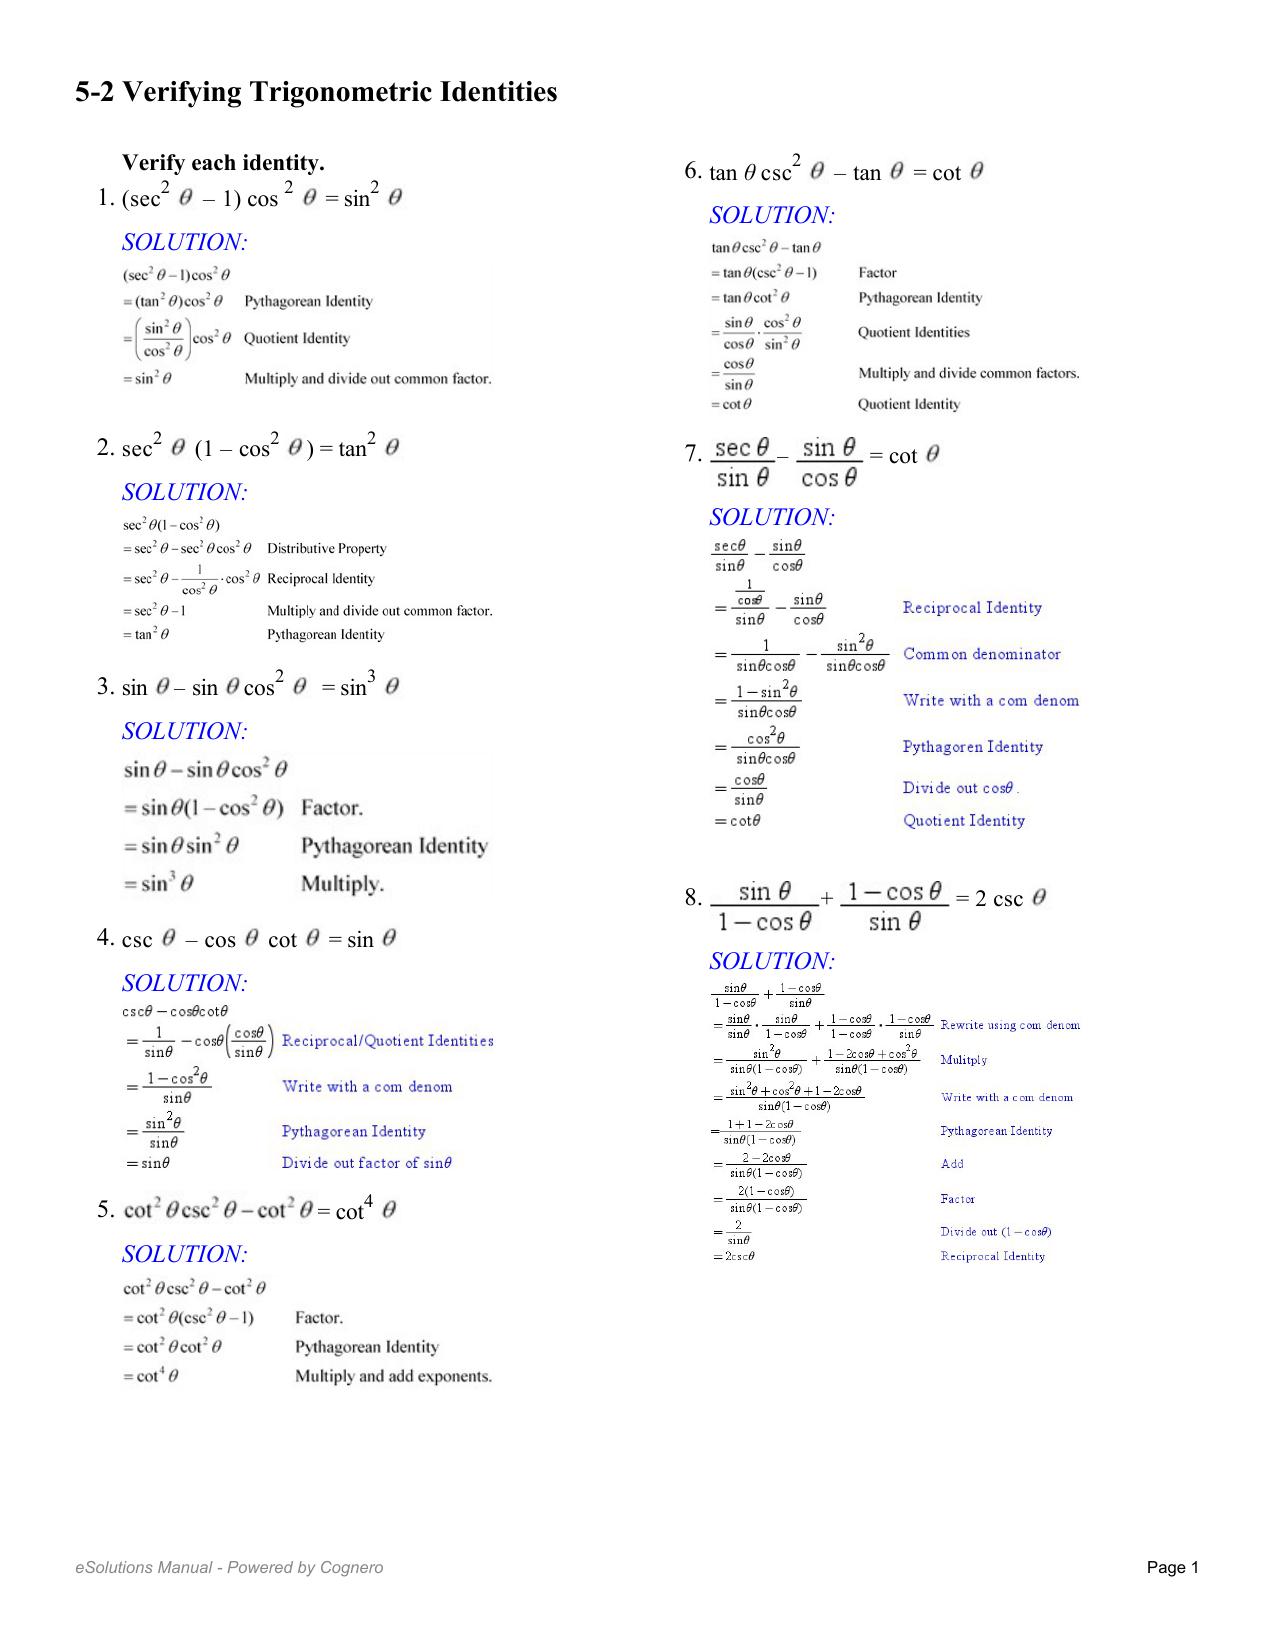 52 Verifying Trigonometric Identities Or Proving Trigonometric Identities Worksheet With Answers